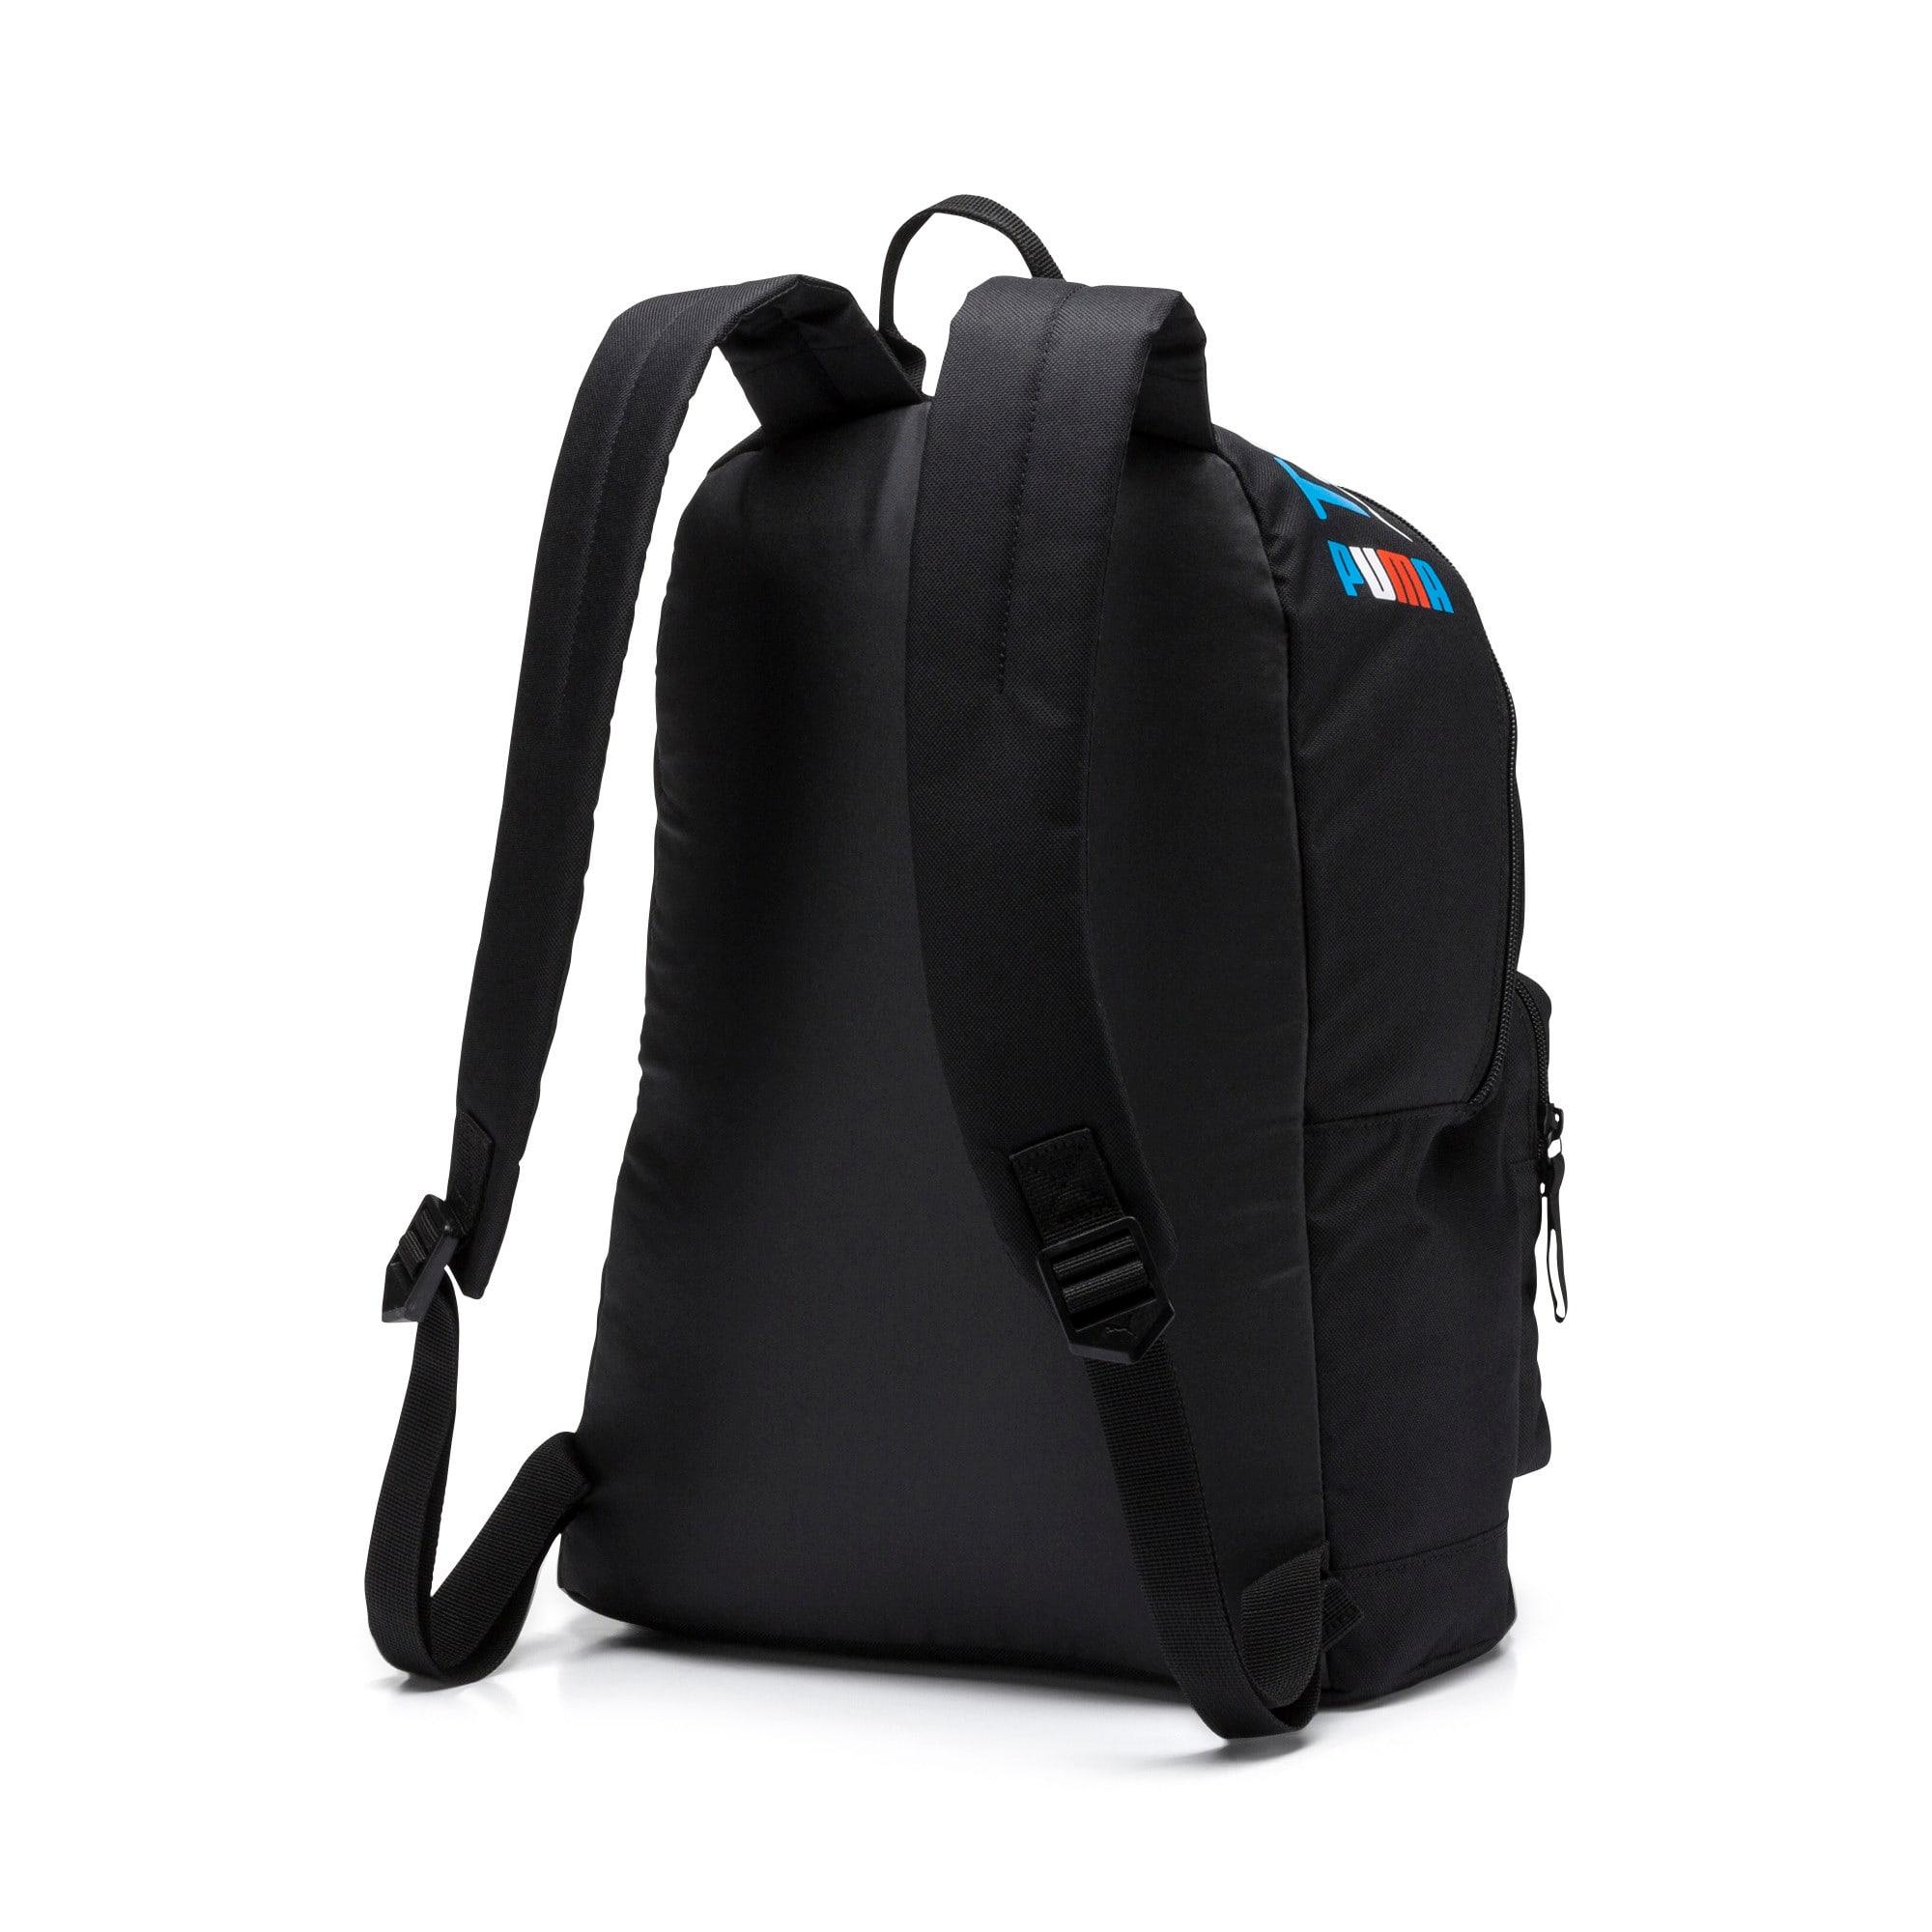 Thumbnail 2 of Sesame Street Kids' Backpack, Puma Black, medium